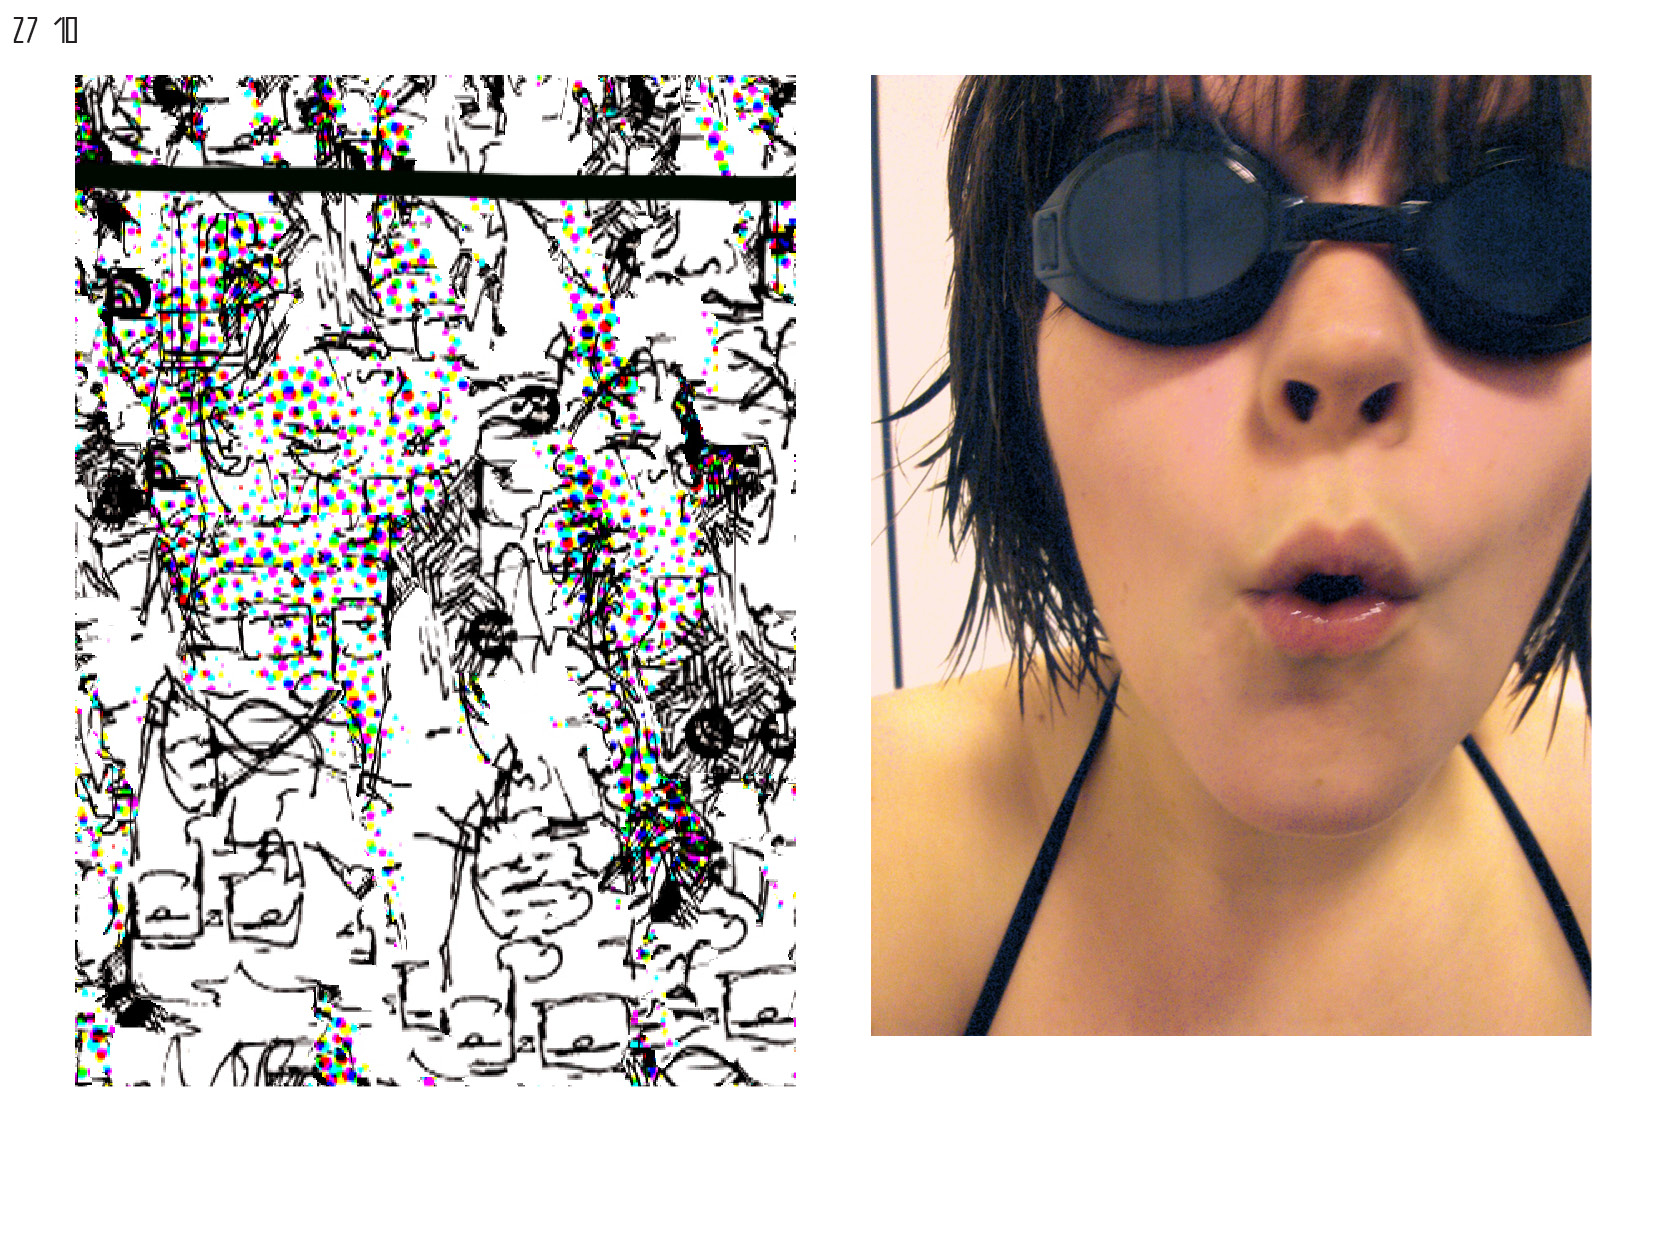 Gerrit-Schweiger-Dialog-Städte-Paris-Berlin-Jessica-Blank-Experiment-Fotoserie-Tagebuch-visuelle-Kommunikation-12